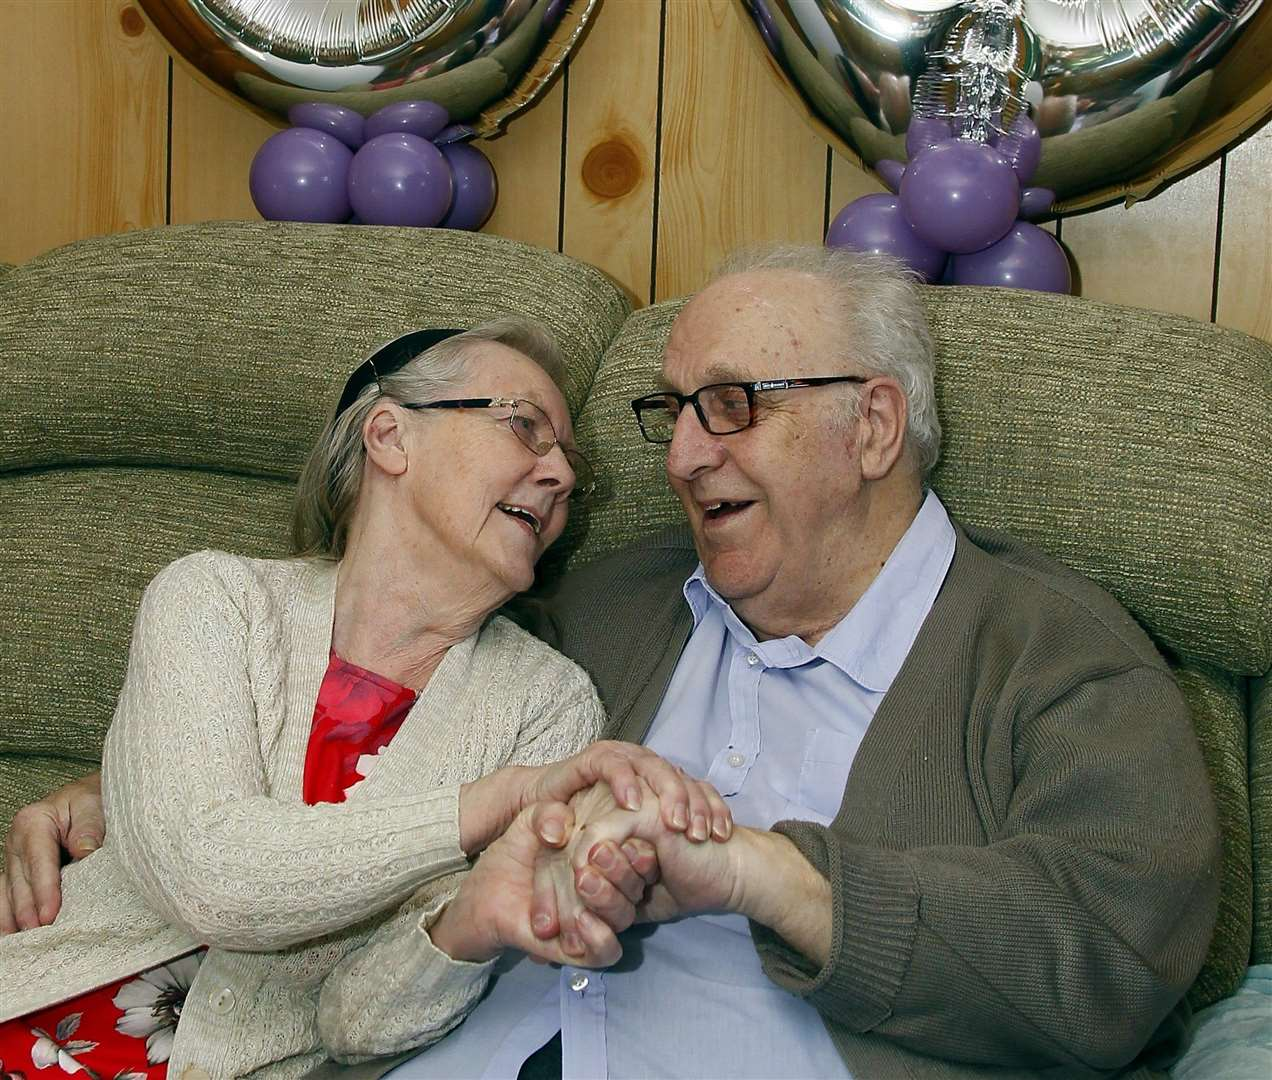 rushenden couple matthew and hazel bodiam celebrated